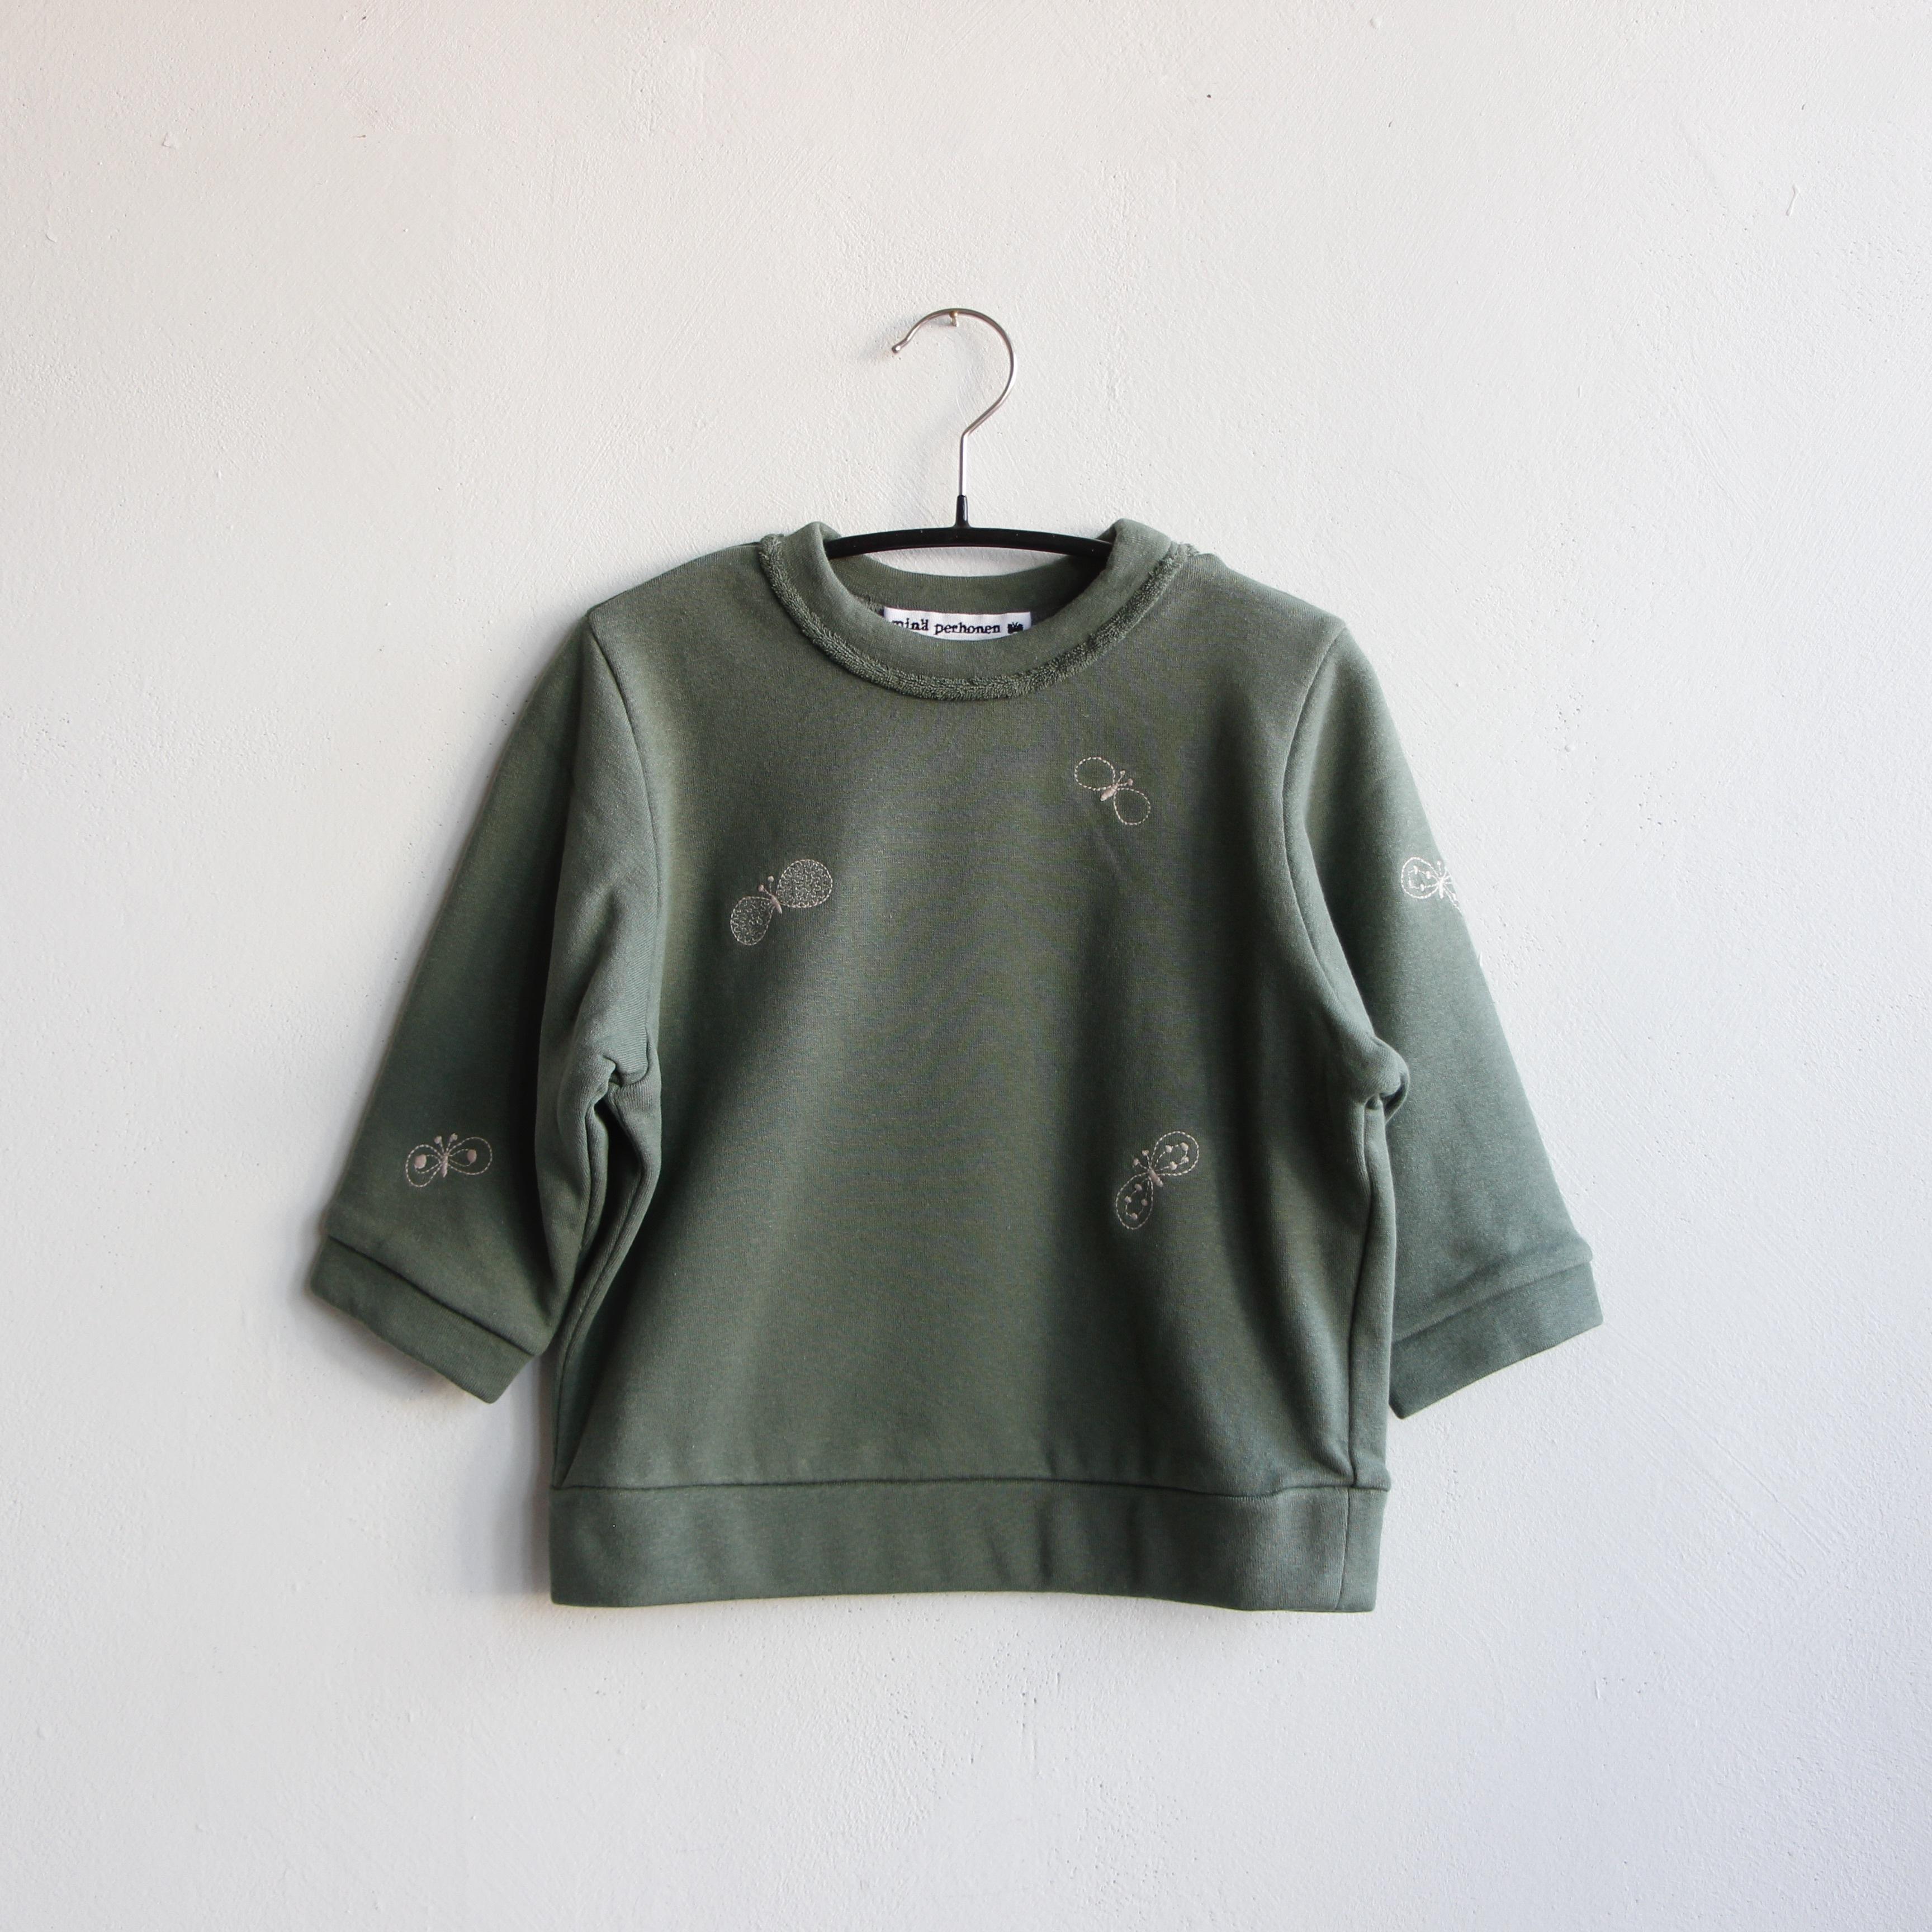 《mina perhonen 2020AW》choucho プルオーバー / moss green / 110-120cm